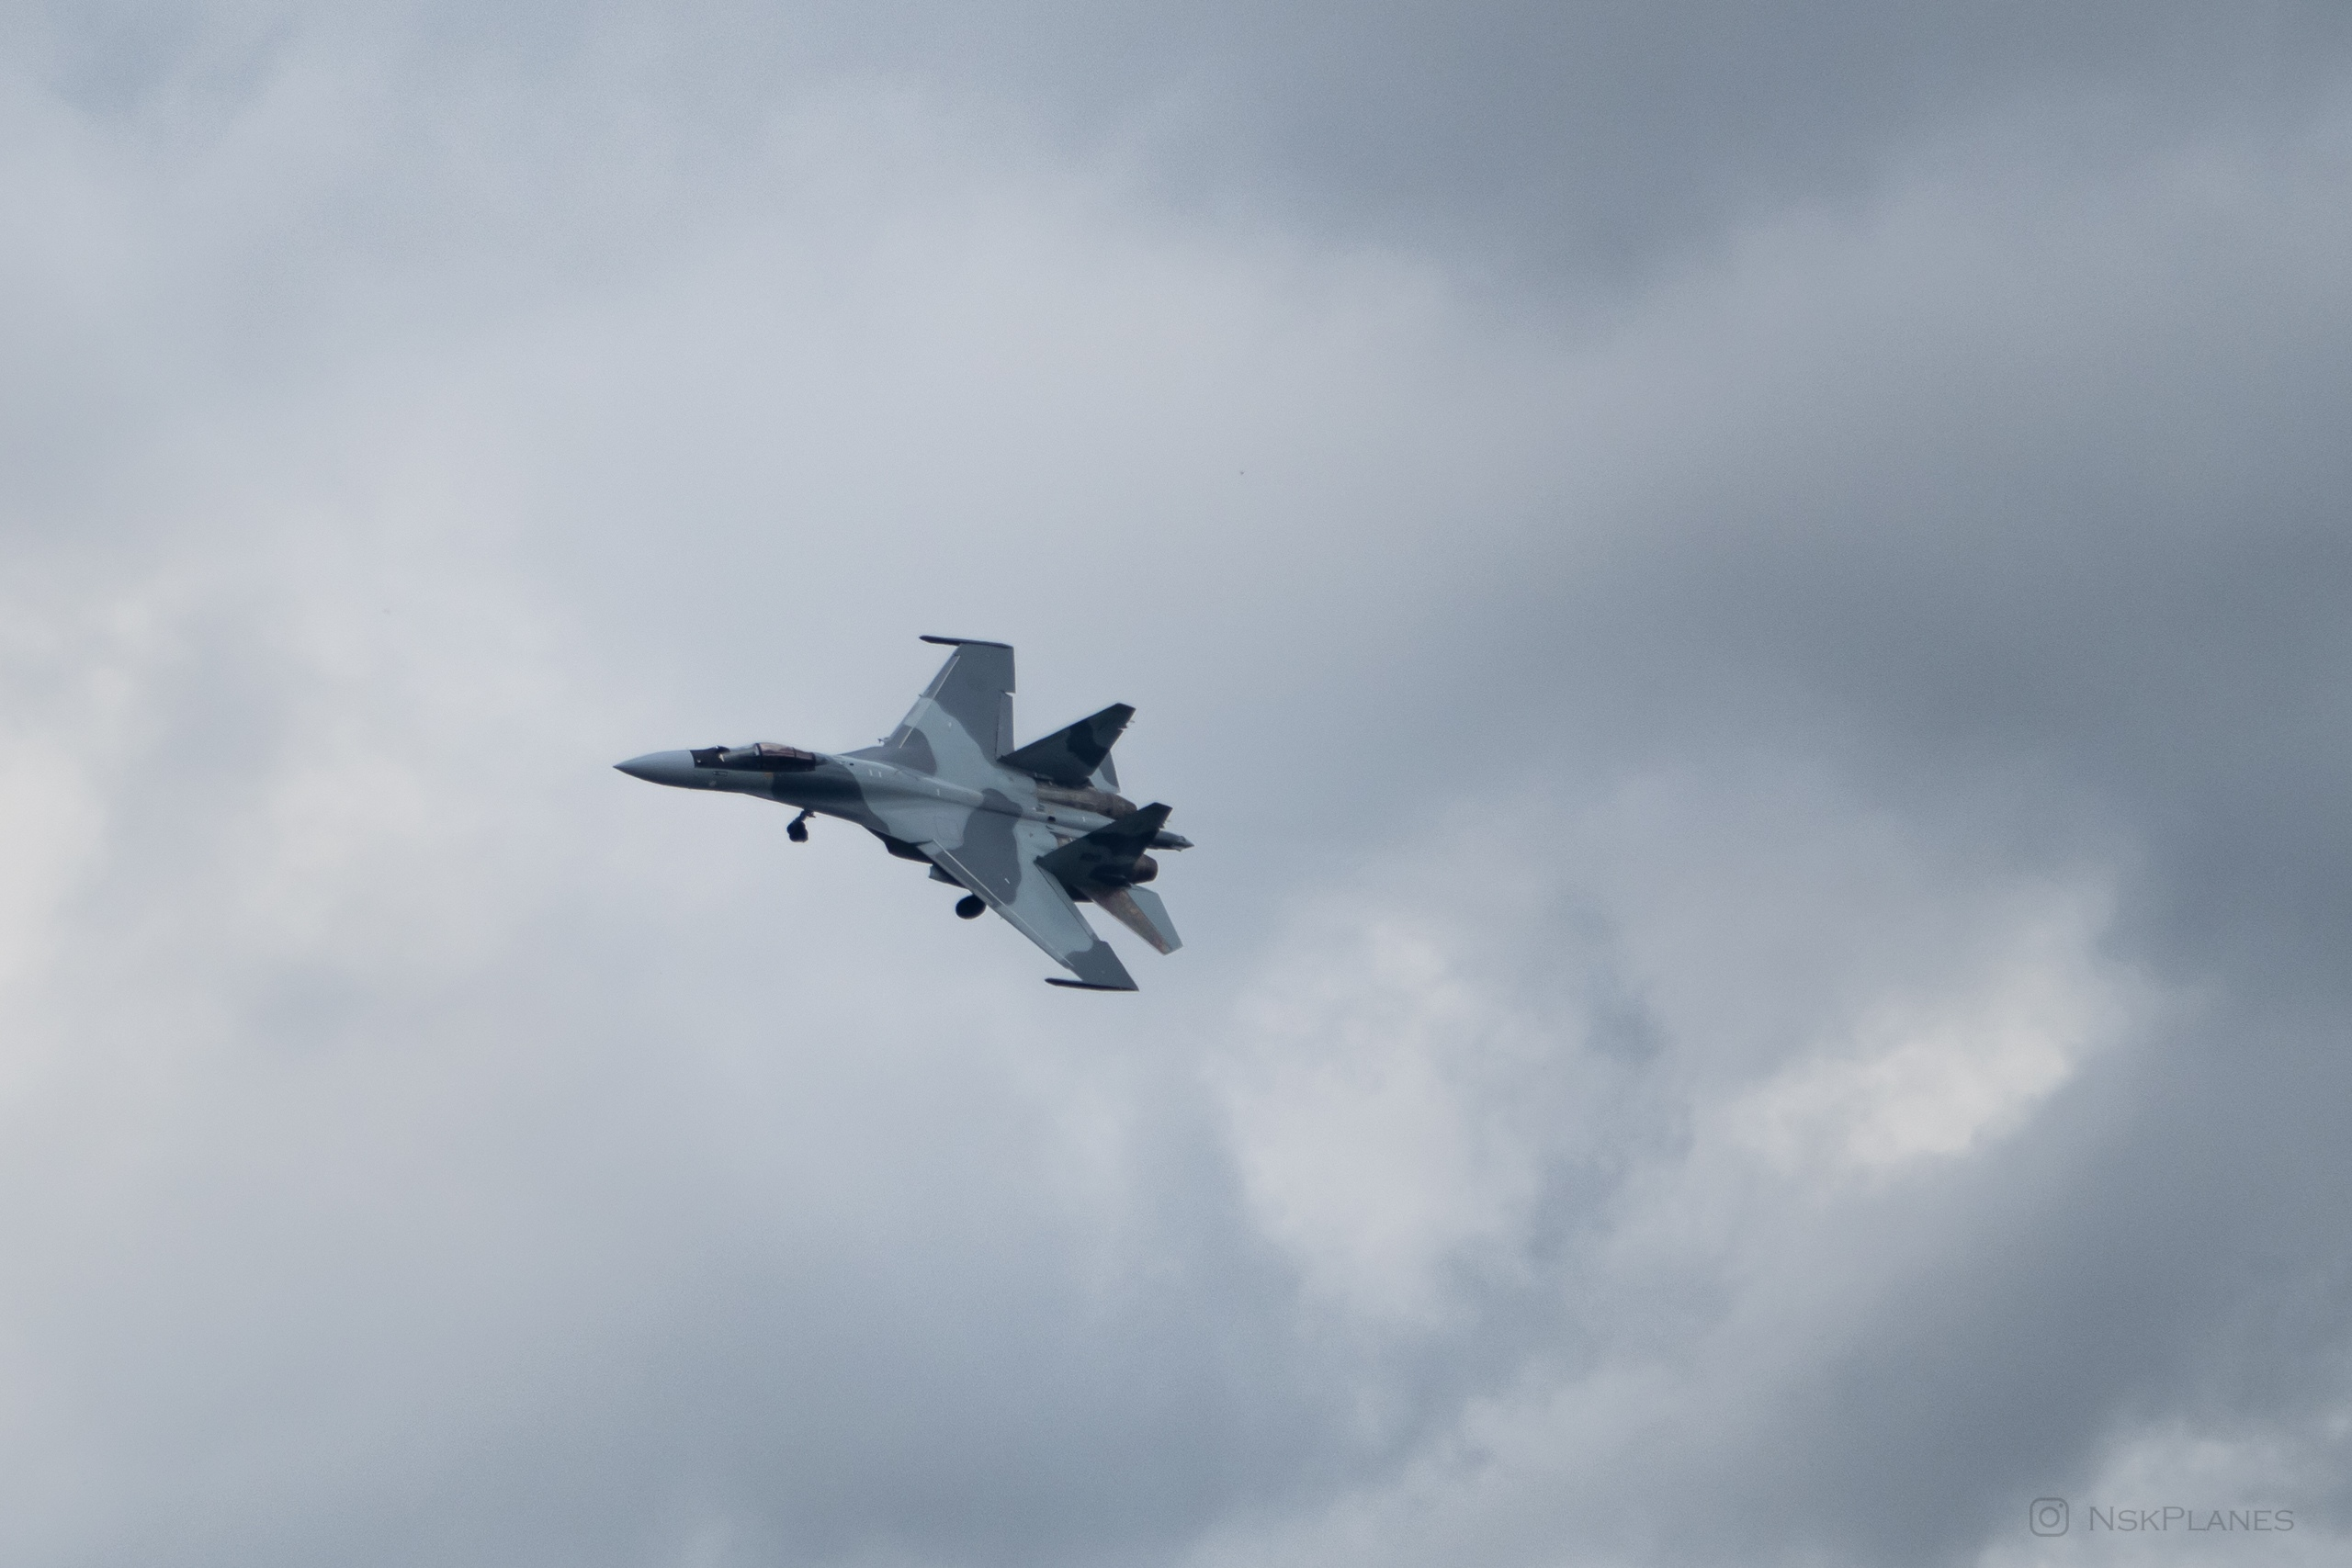 http://forums.airforce.ru/attachments/sovremennost/100201d1595419760-wkn9mwejzt8.jpg/